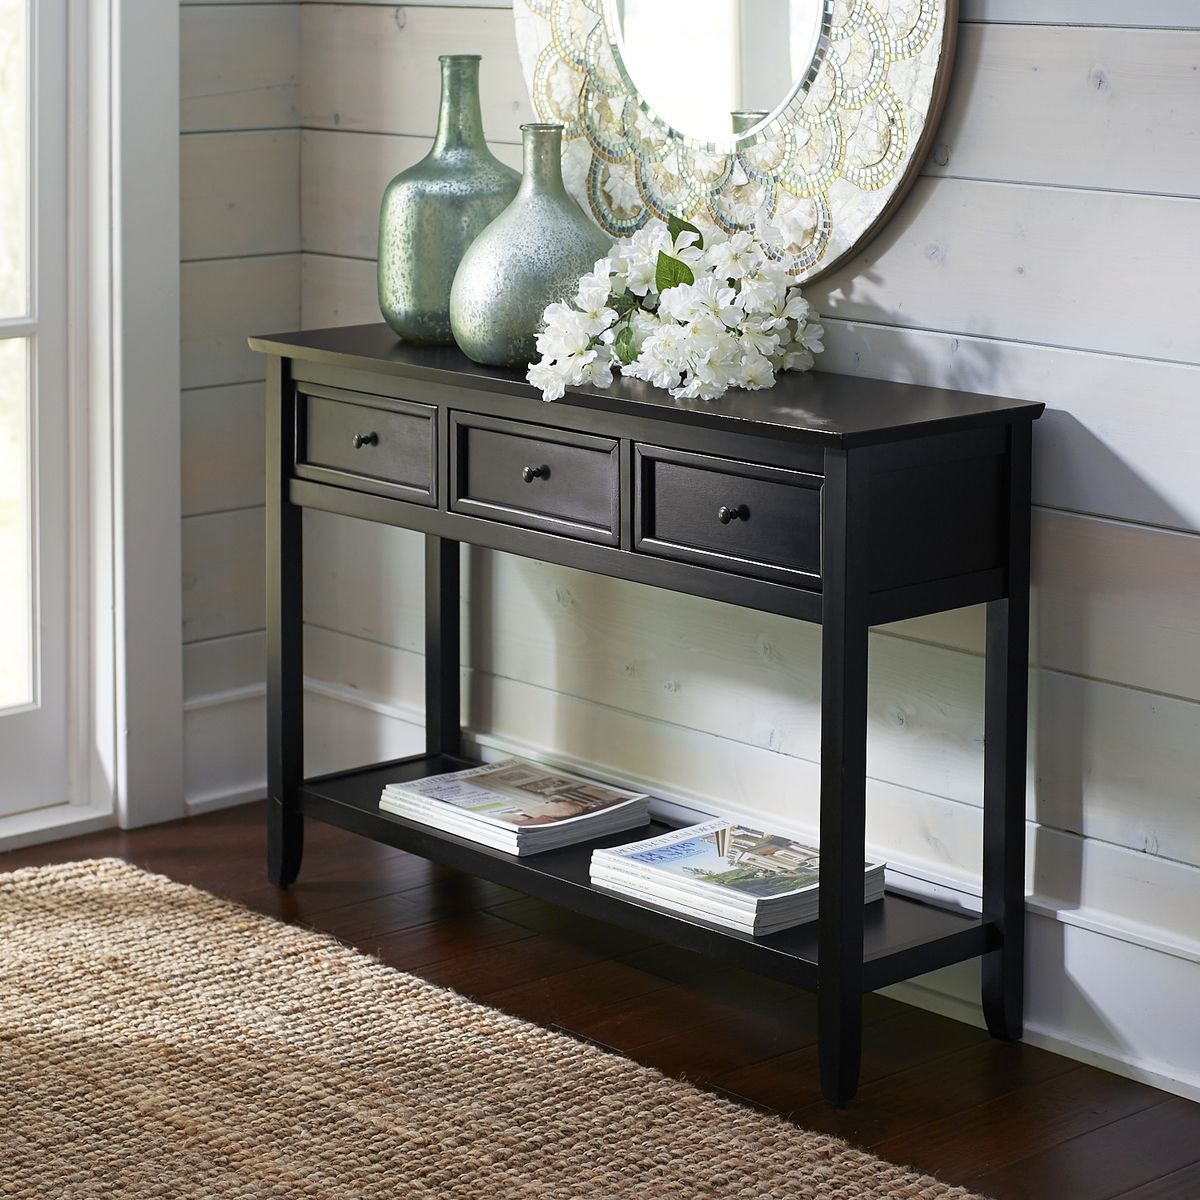 Pin By Caneil Mcdonald On Stylish Living Black Console Table Decor Black Console Table Console Table Decorating